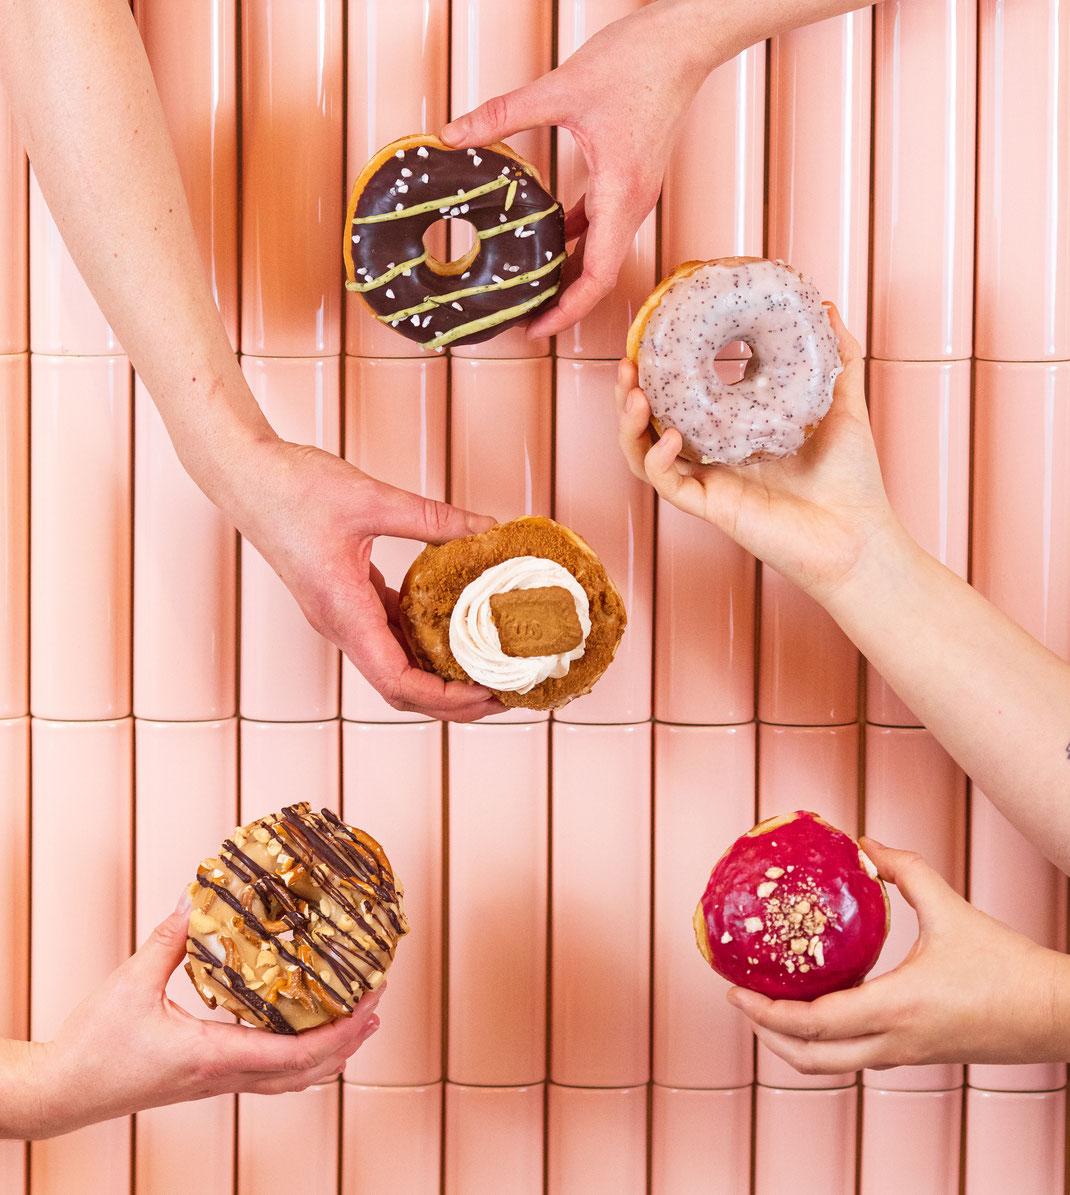 Social Media Content Creation Fotografie für Social Media vegane Donuts Berlin Brammibal's Donuts Produktfotografie Facebook Instagram Content Creator Berlin Foodphotography